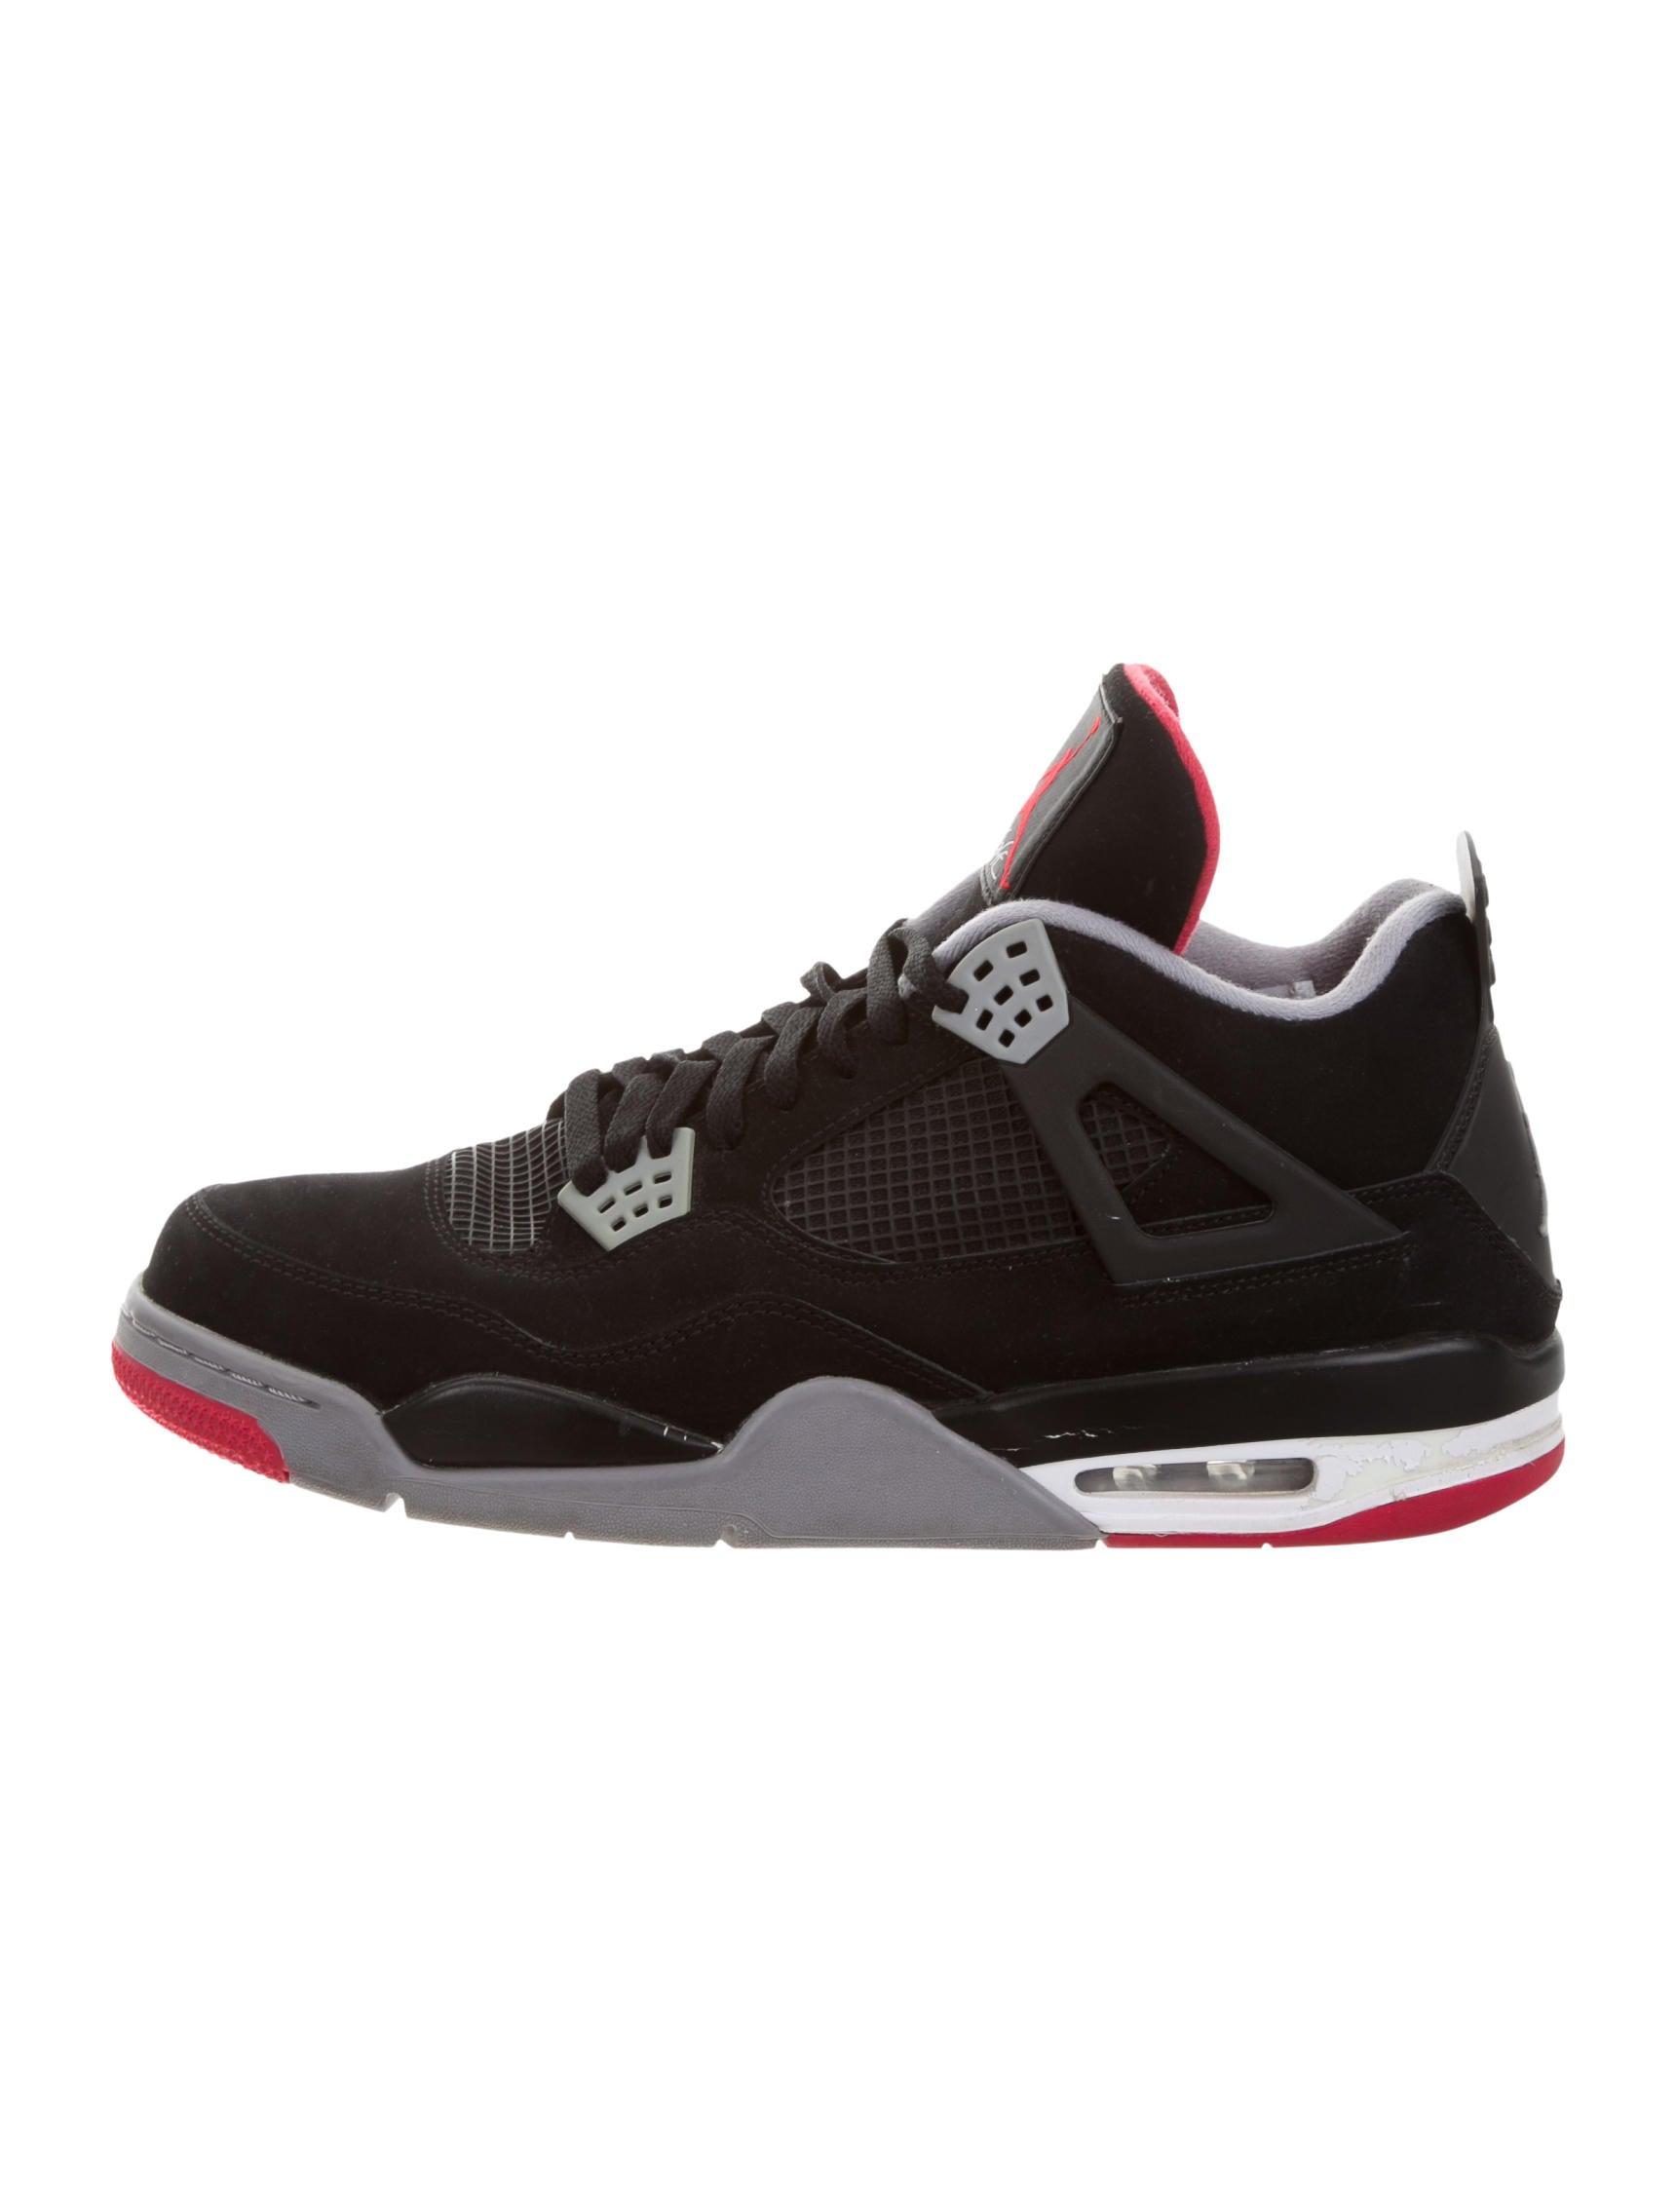 nike air jordan 4 retro bred sneakers shoes wniaj20141 the realreal. Black Bedroom Furniture Sets. Home Design Ideas